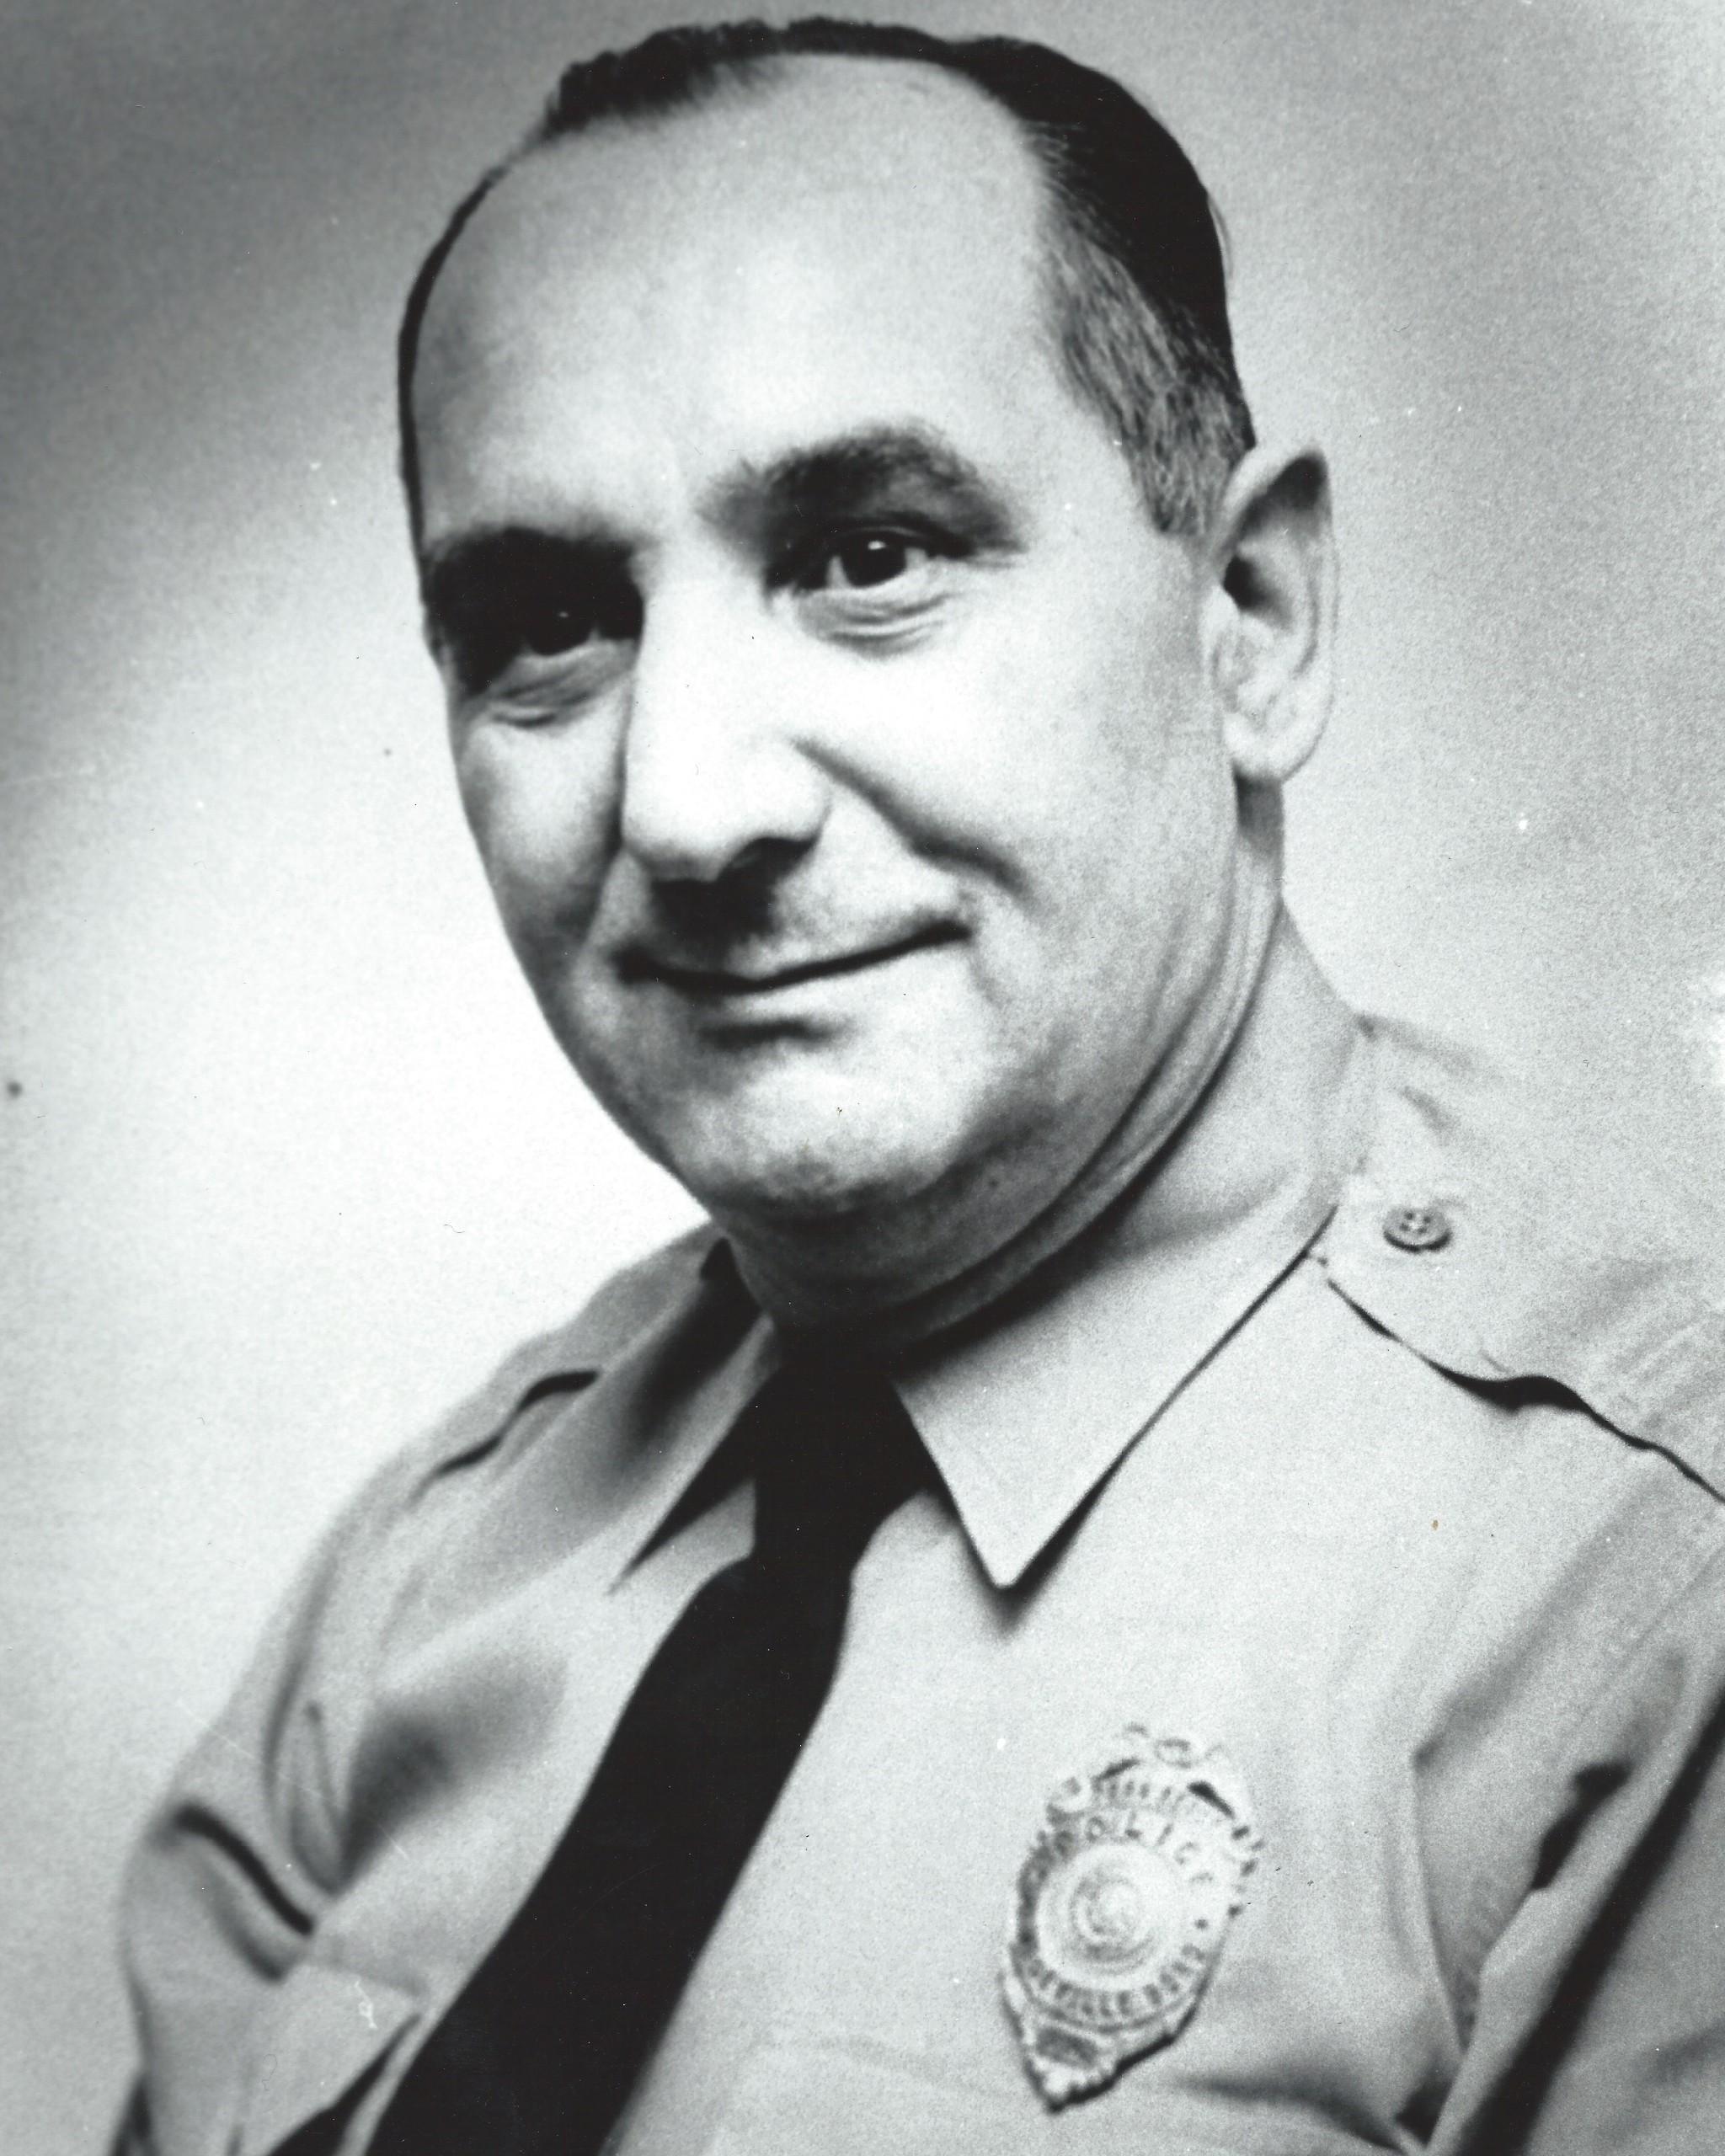 Sergeant Andrew Robert Rusbarsky   Monroeville Borough Police Department, Pennsylvania